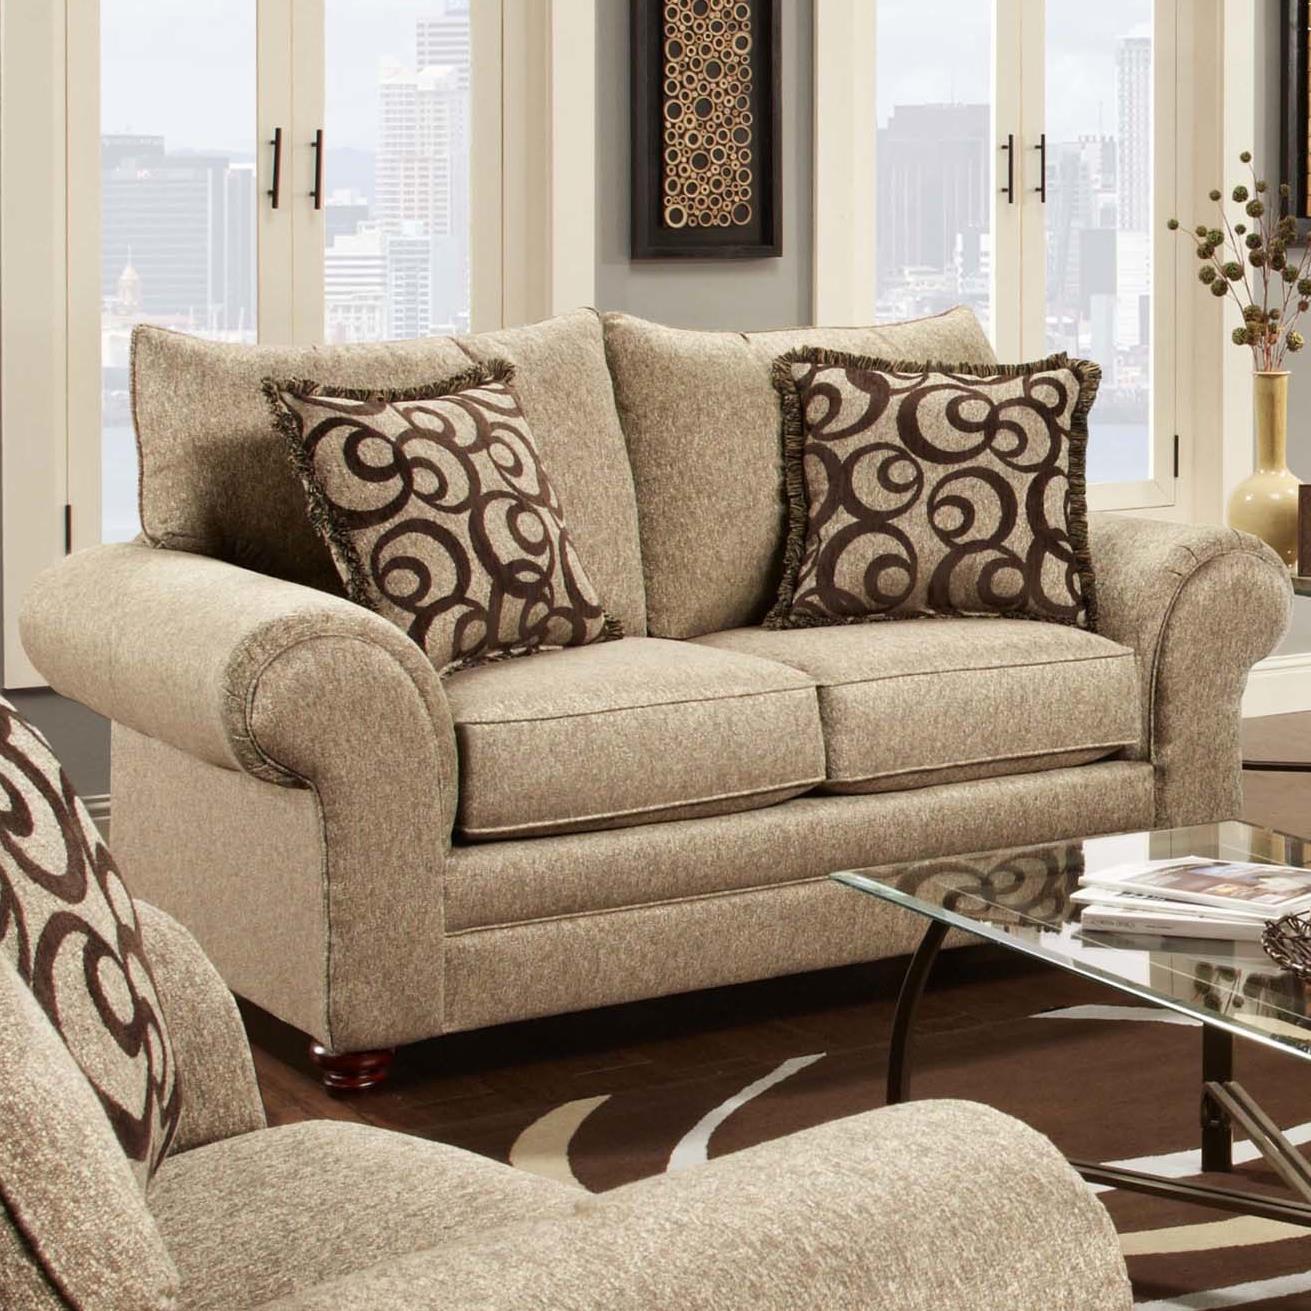 2120 Traditional Loveseat by Washington Furniture at Lynn's Furniture & Mattress